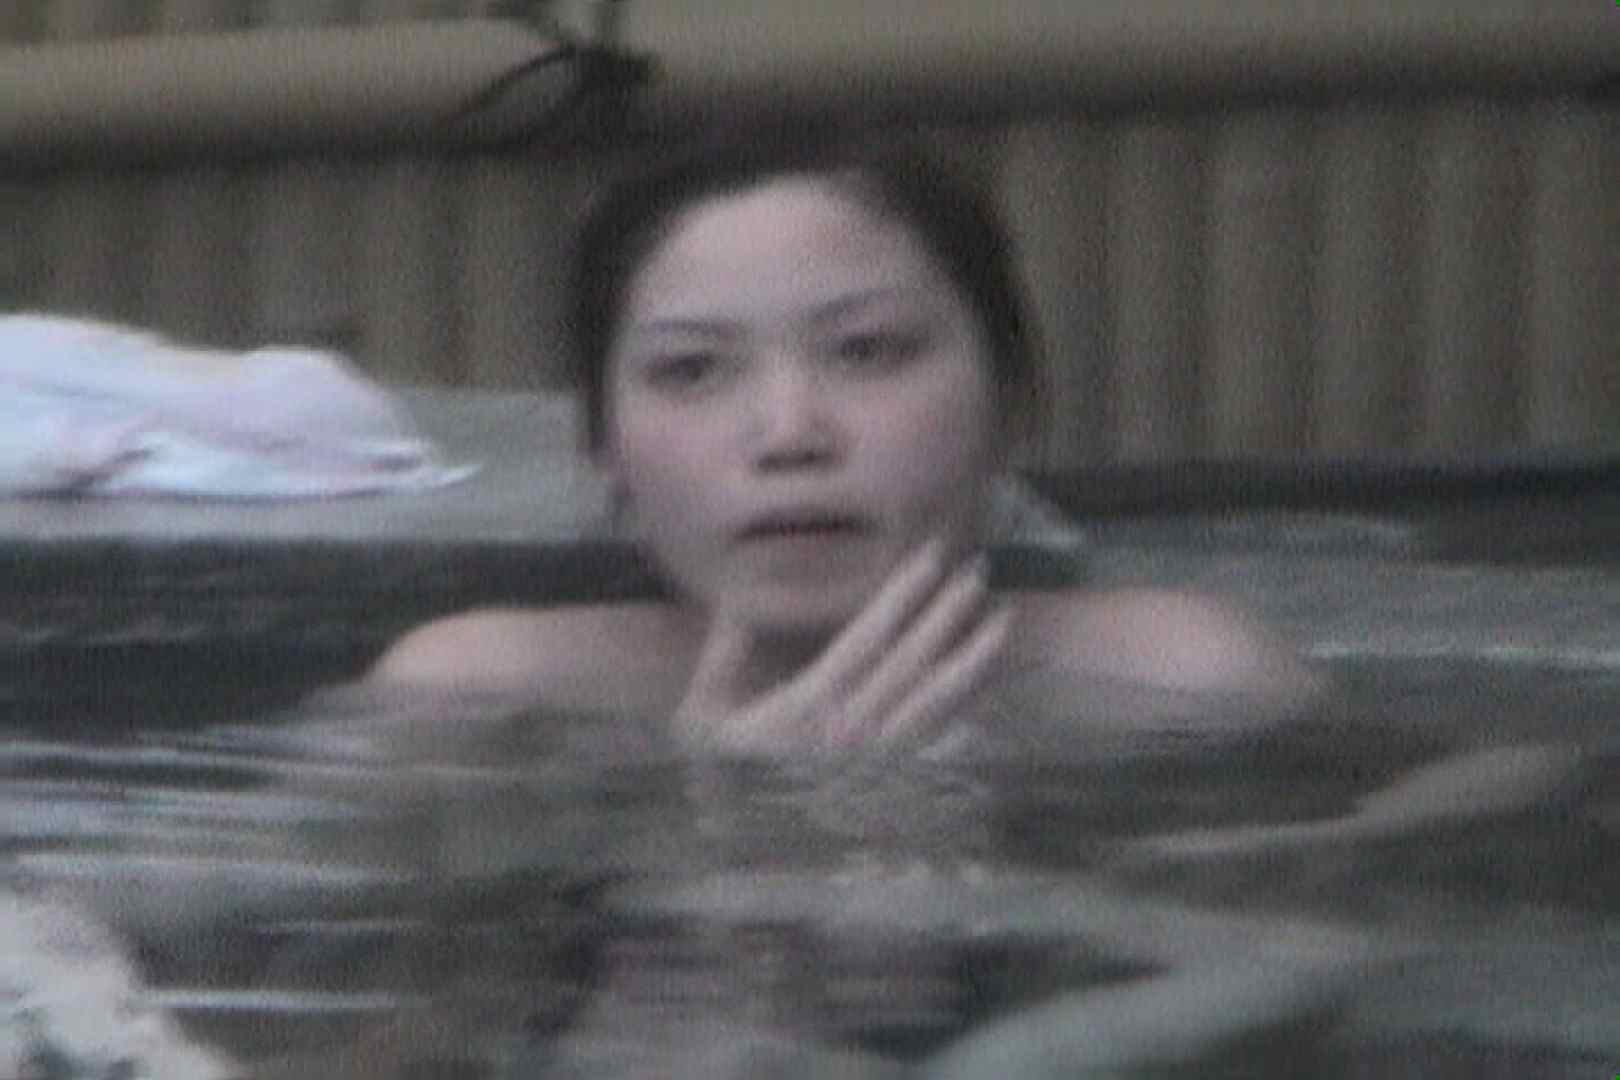 Aquaな露天風呂Vol.602 盗撮師作品  98pic 75